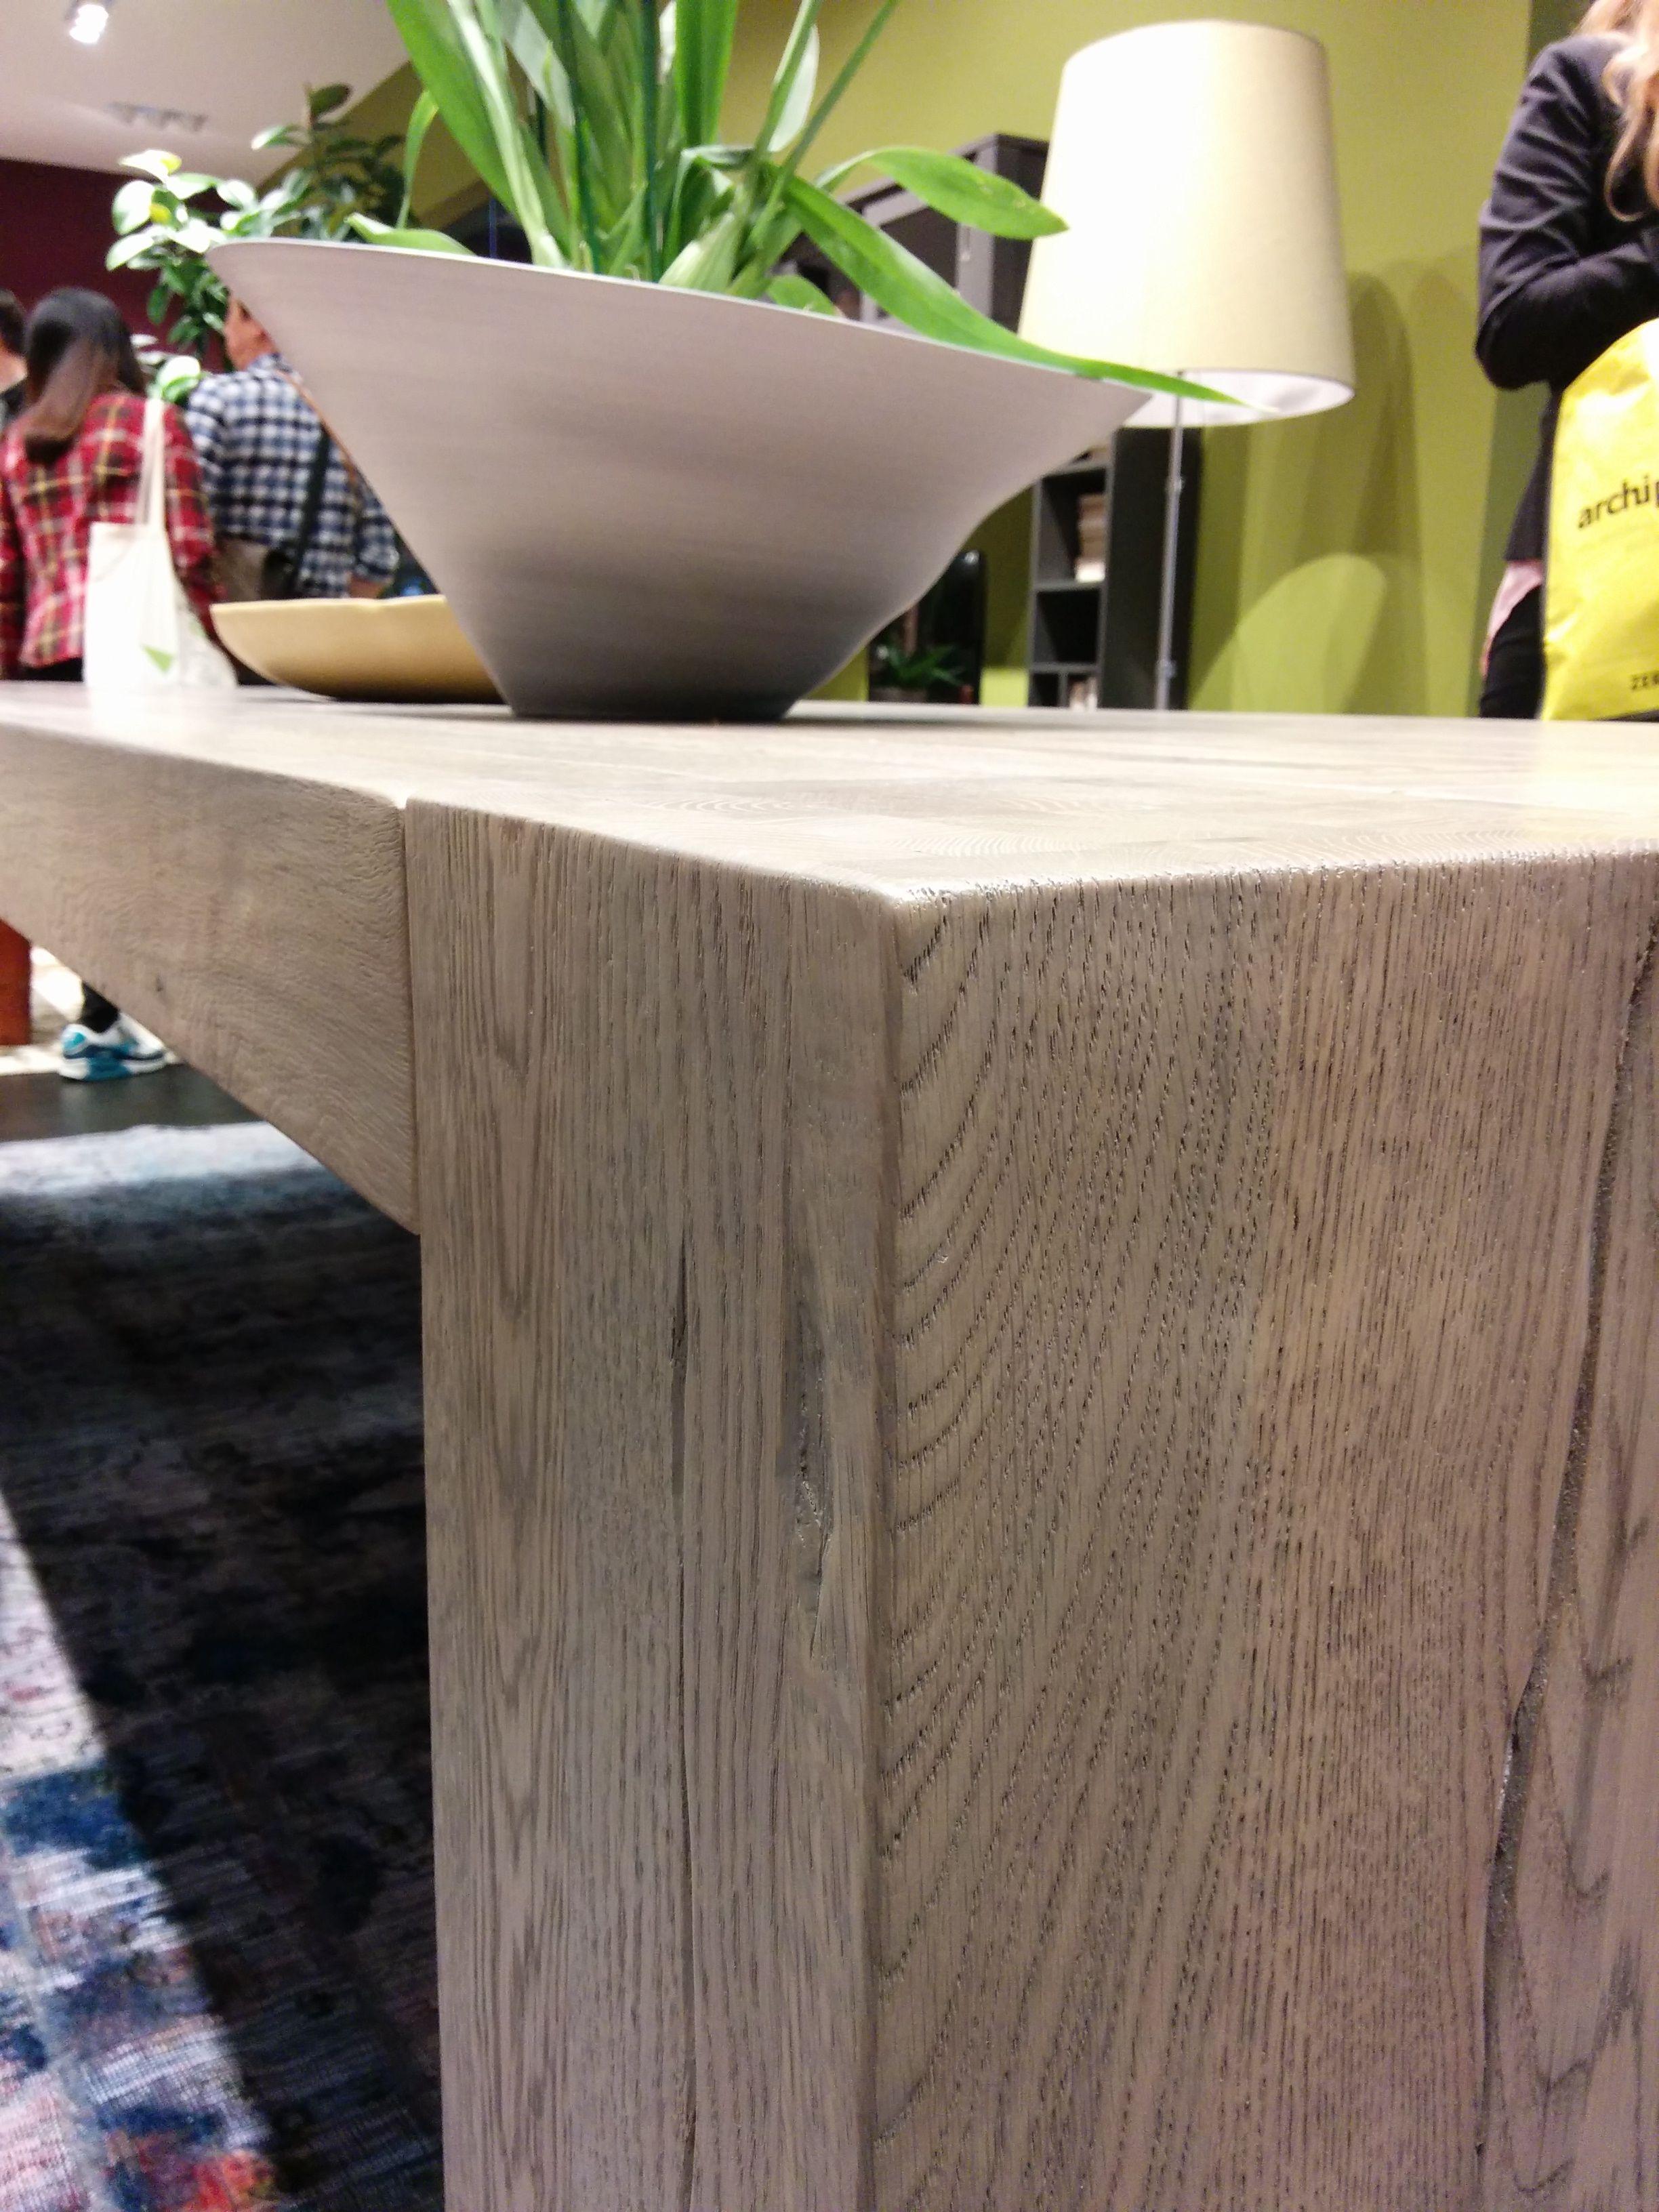 Wooden Table - Devina Nais | WOODEN TABLE DESIGN | Pinterest